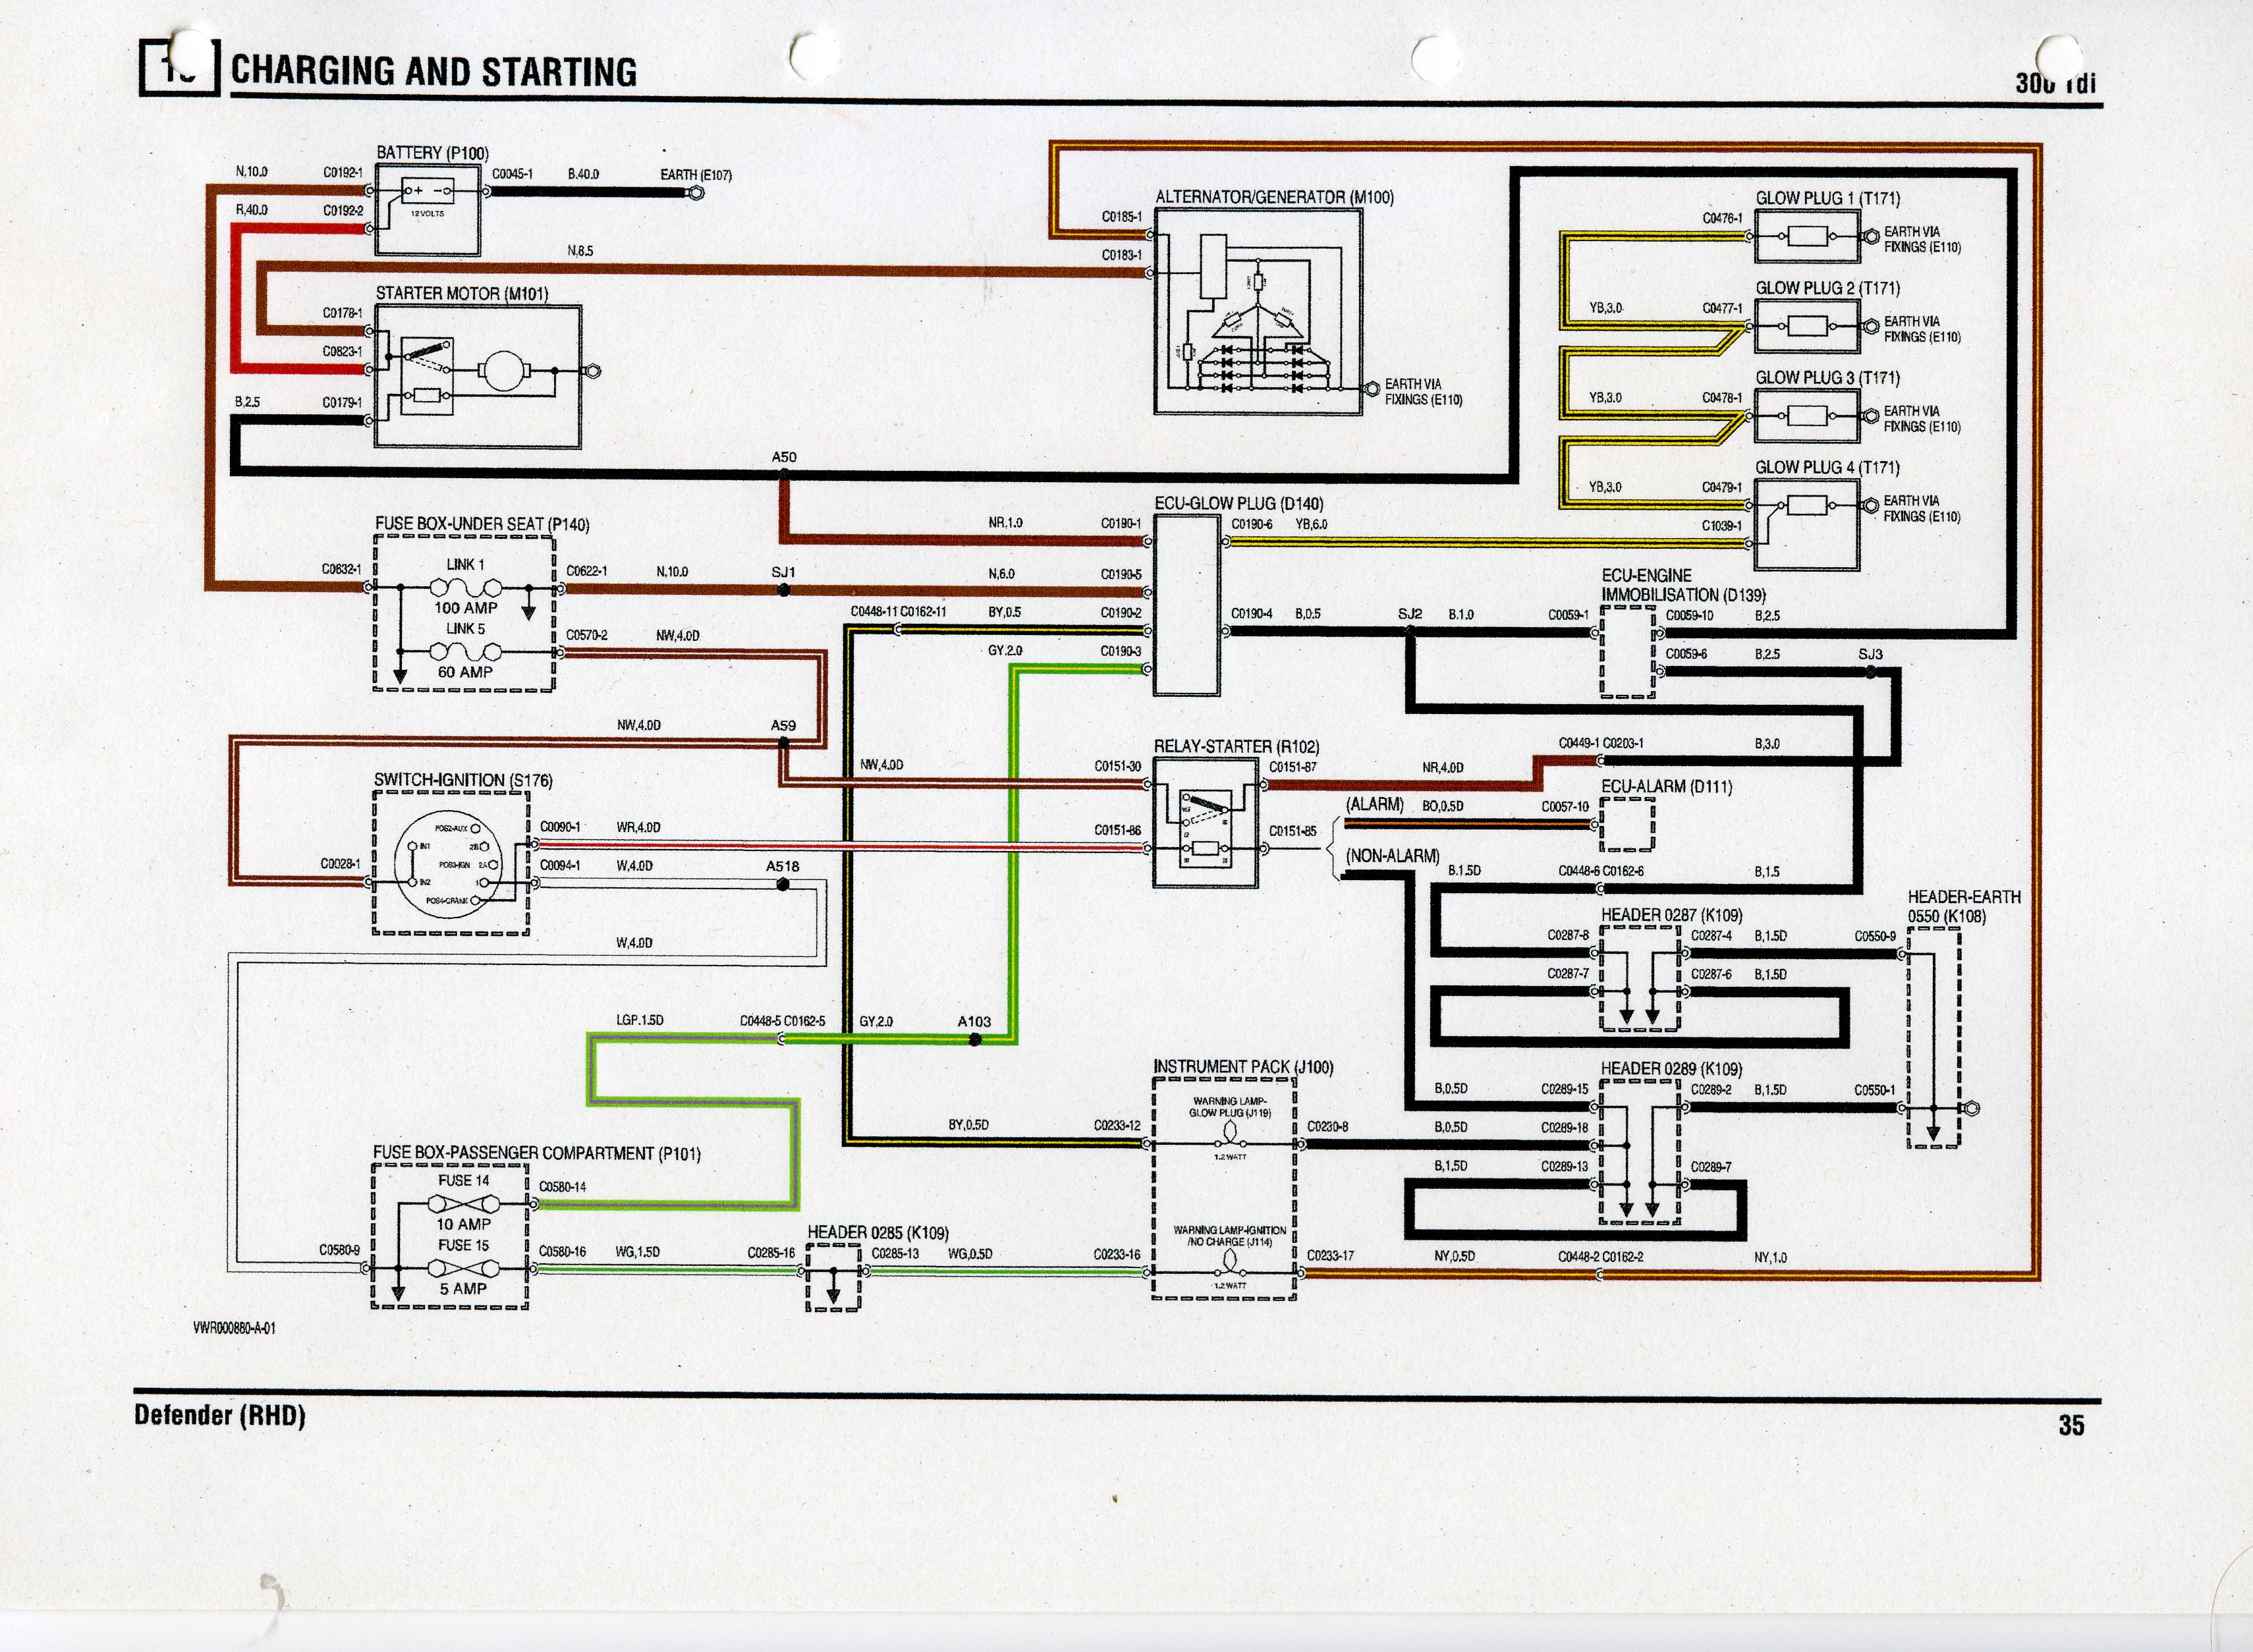 Ignition Switch Wiring 300tdi - Defender Forum